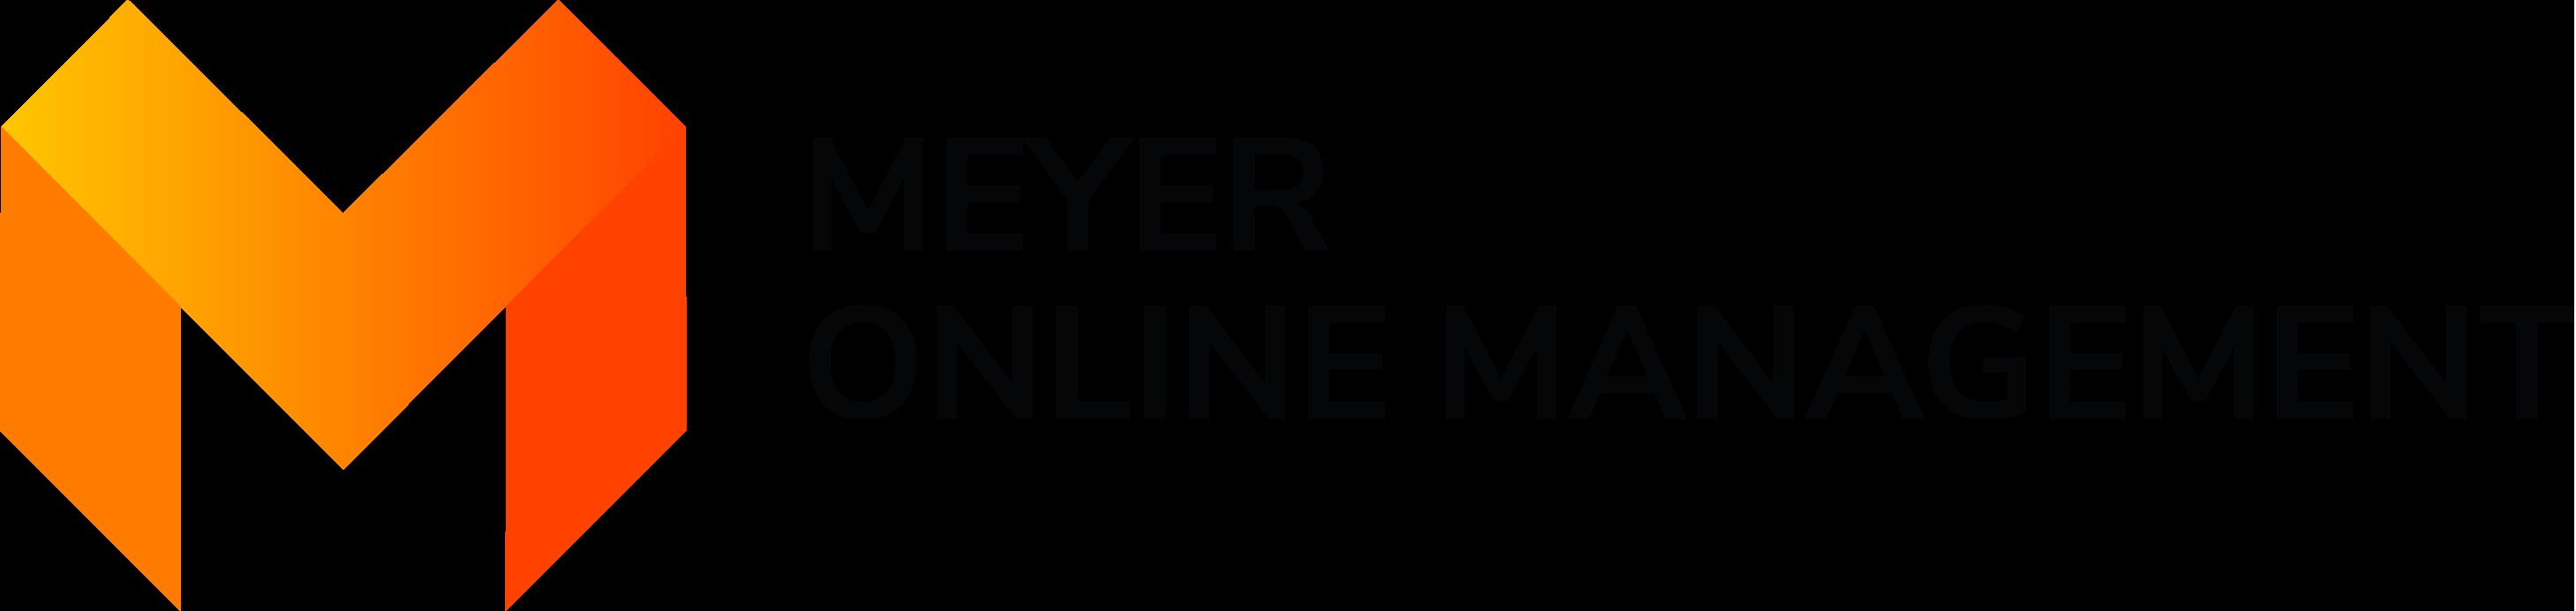 Meyer Online Management Logo